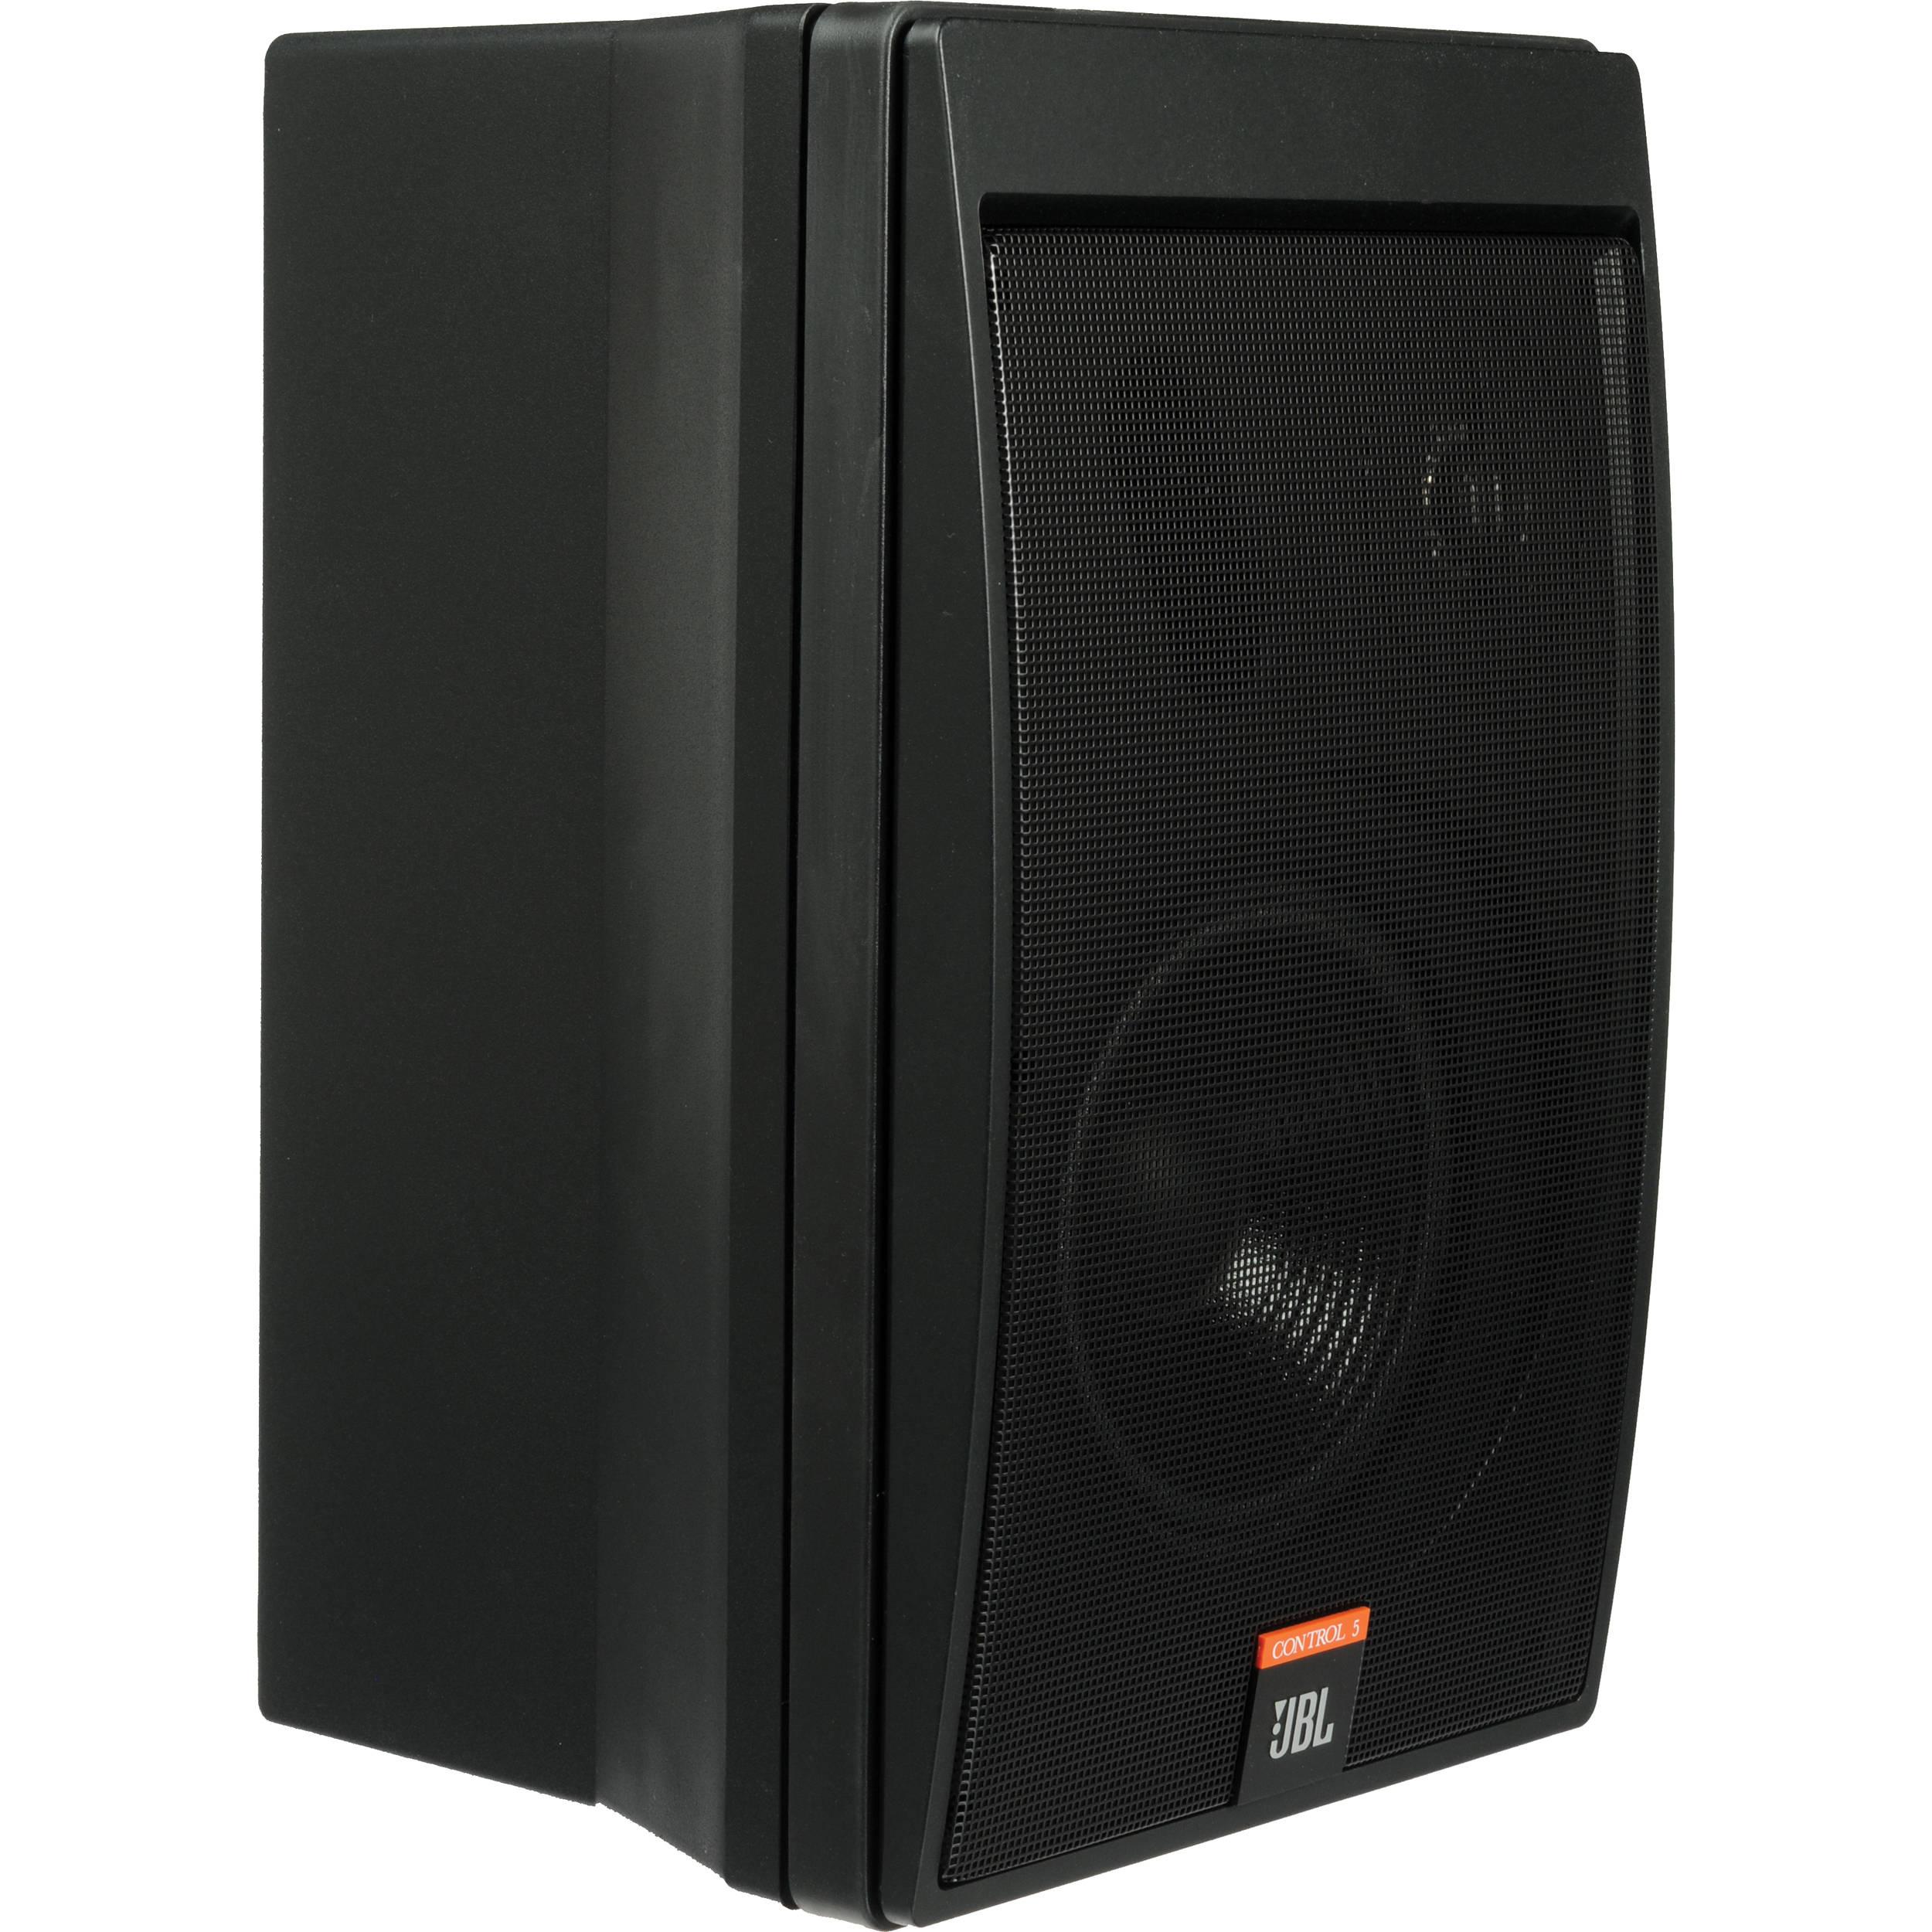 jbl 6 5. jbl control 5 compact monitor - (pair) jbl 6